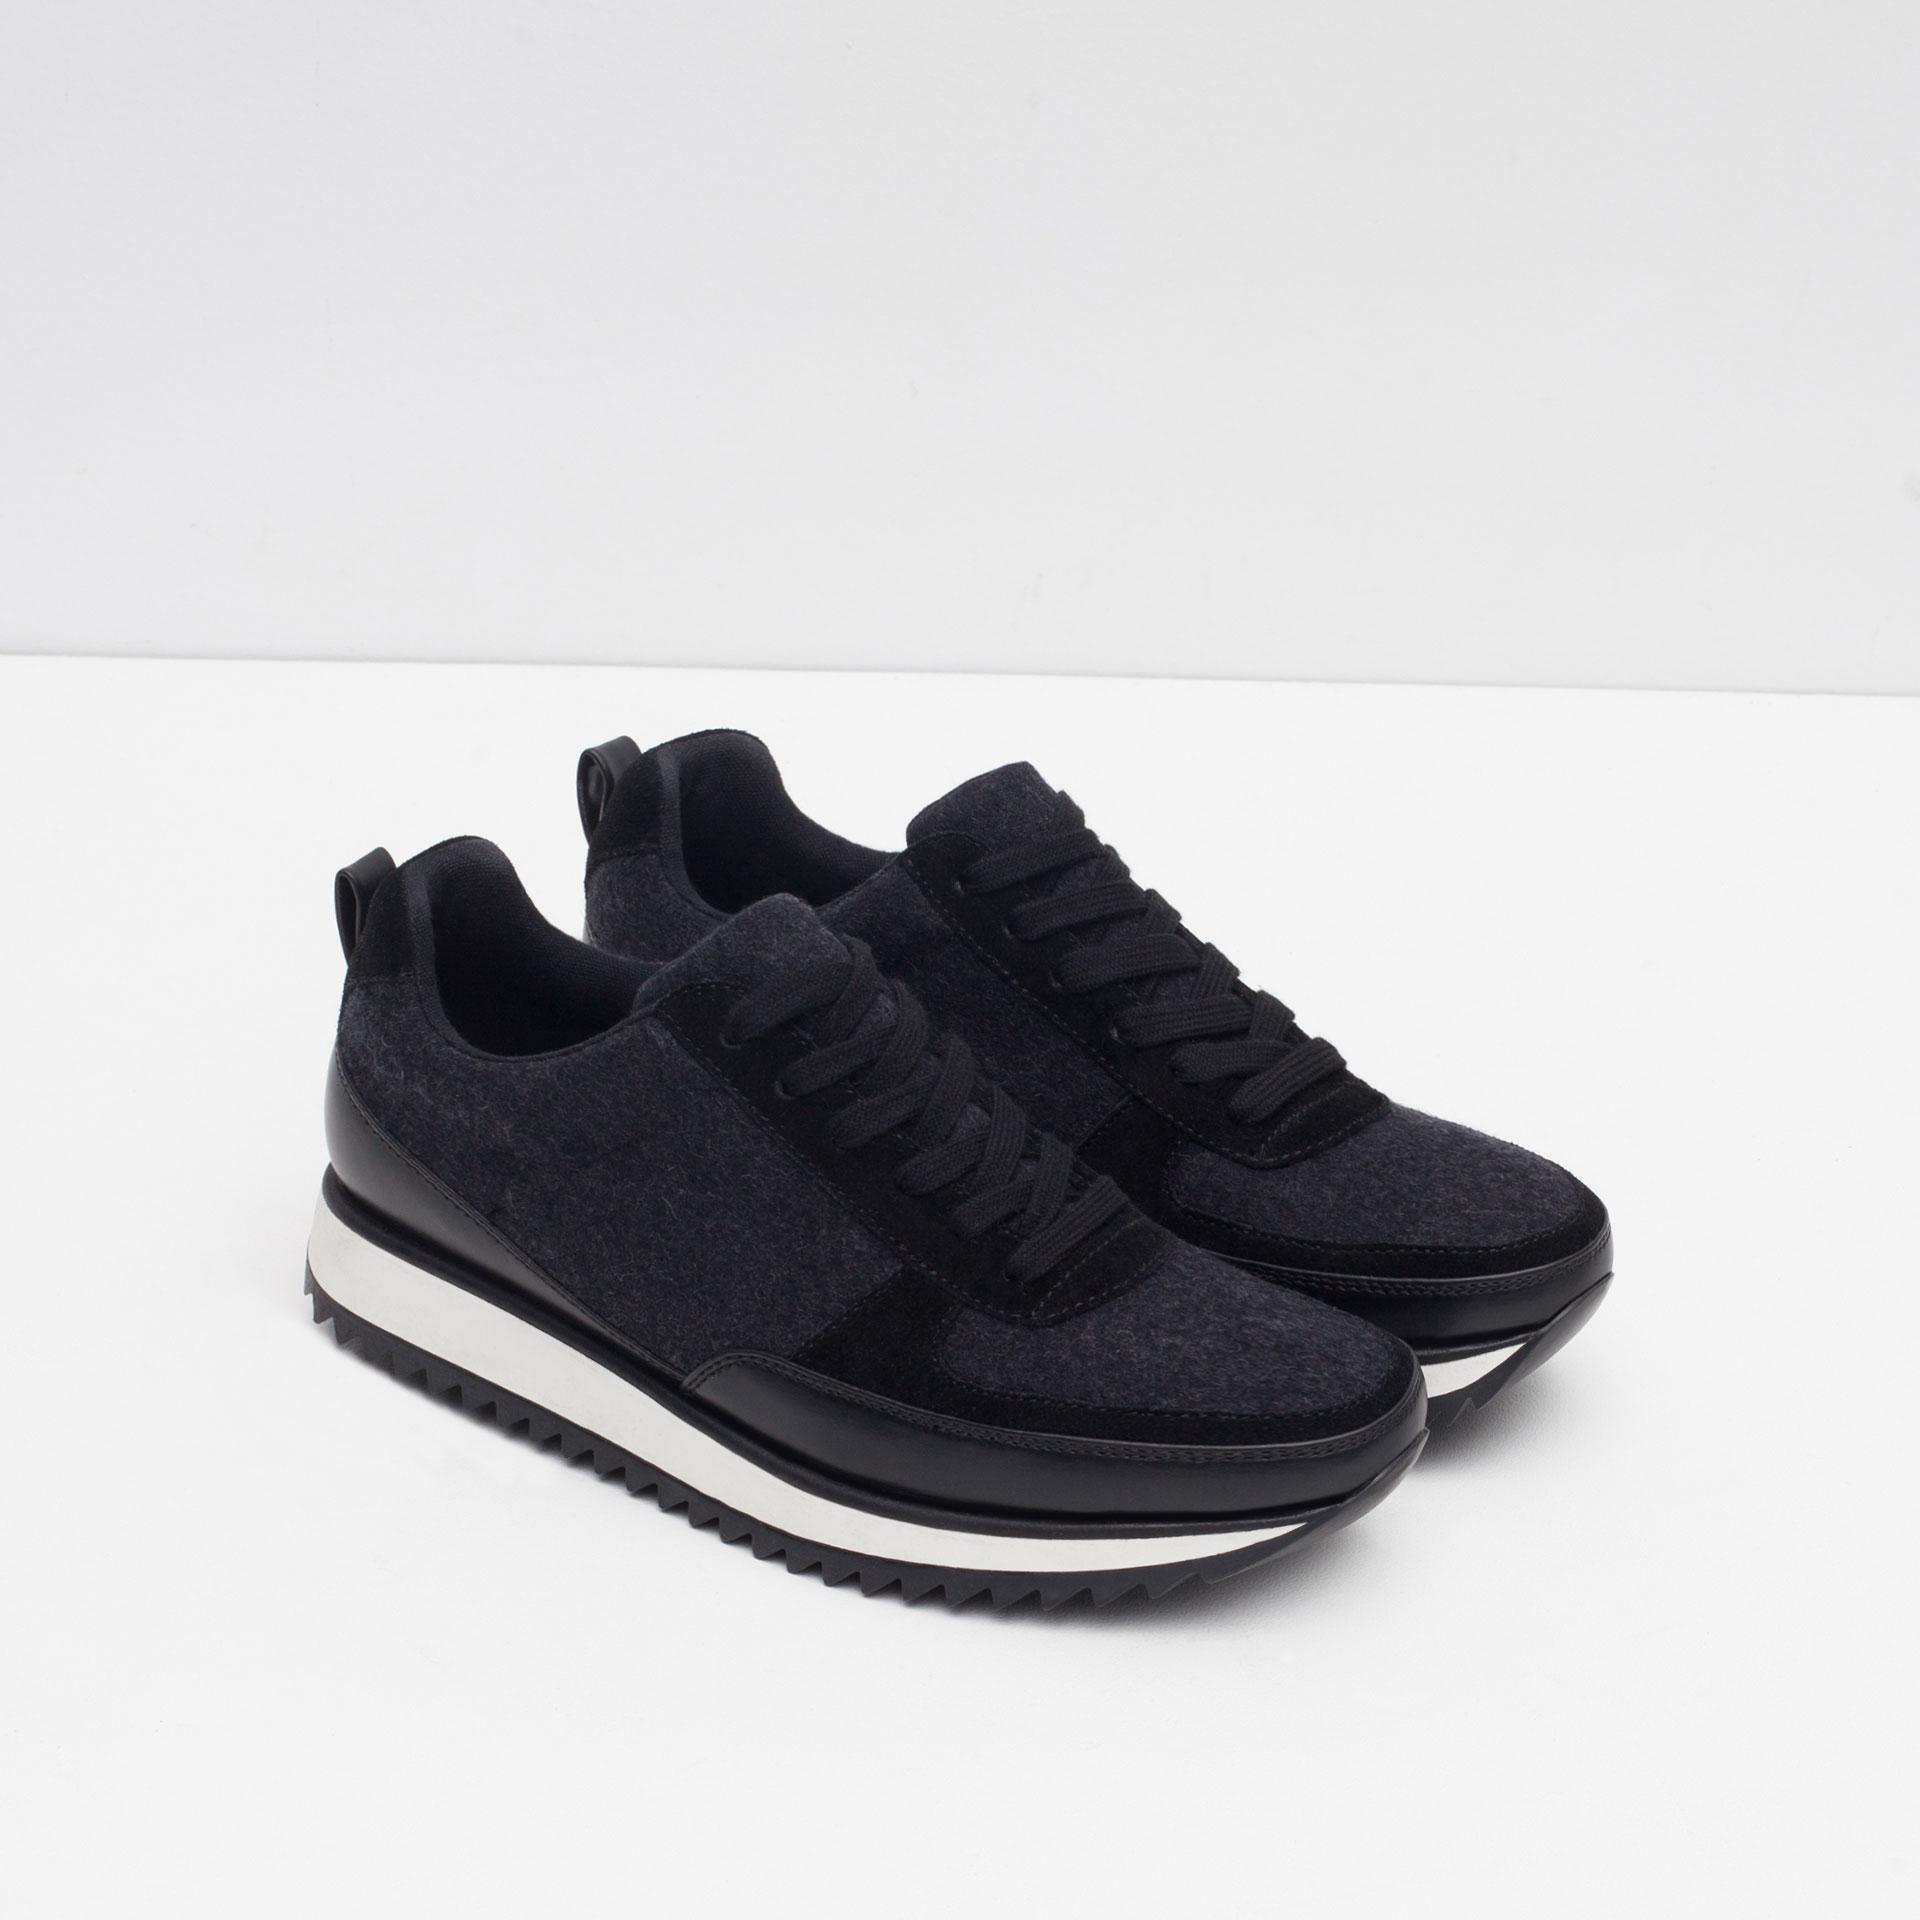 Zara Shoes Black Heels